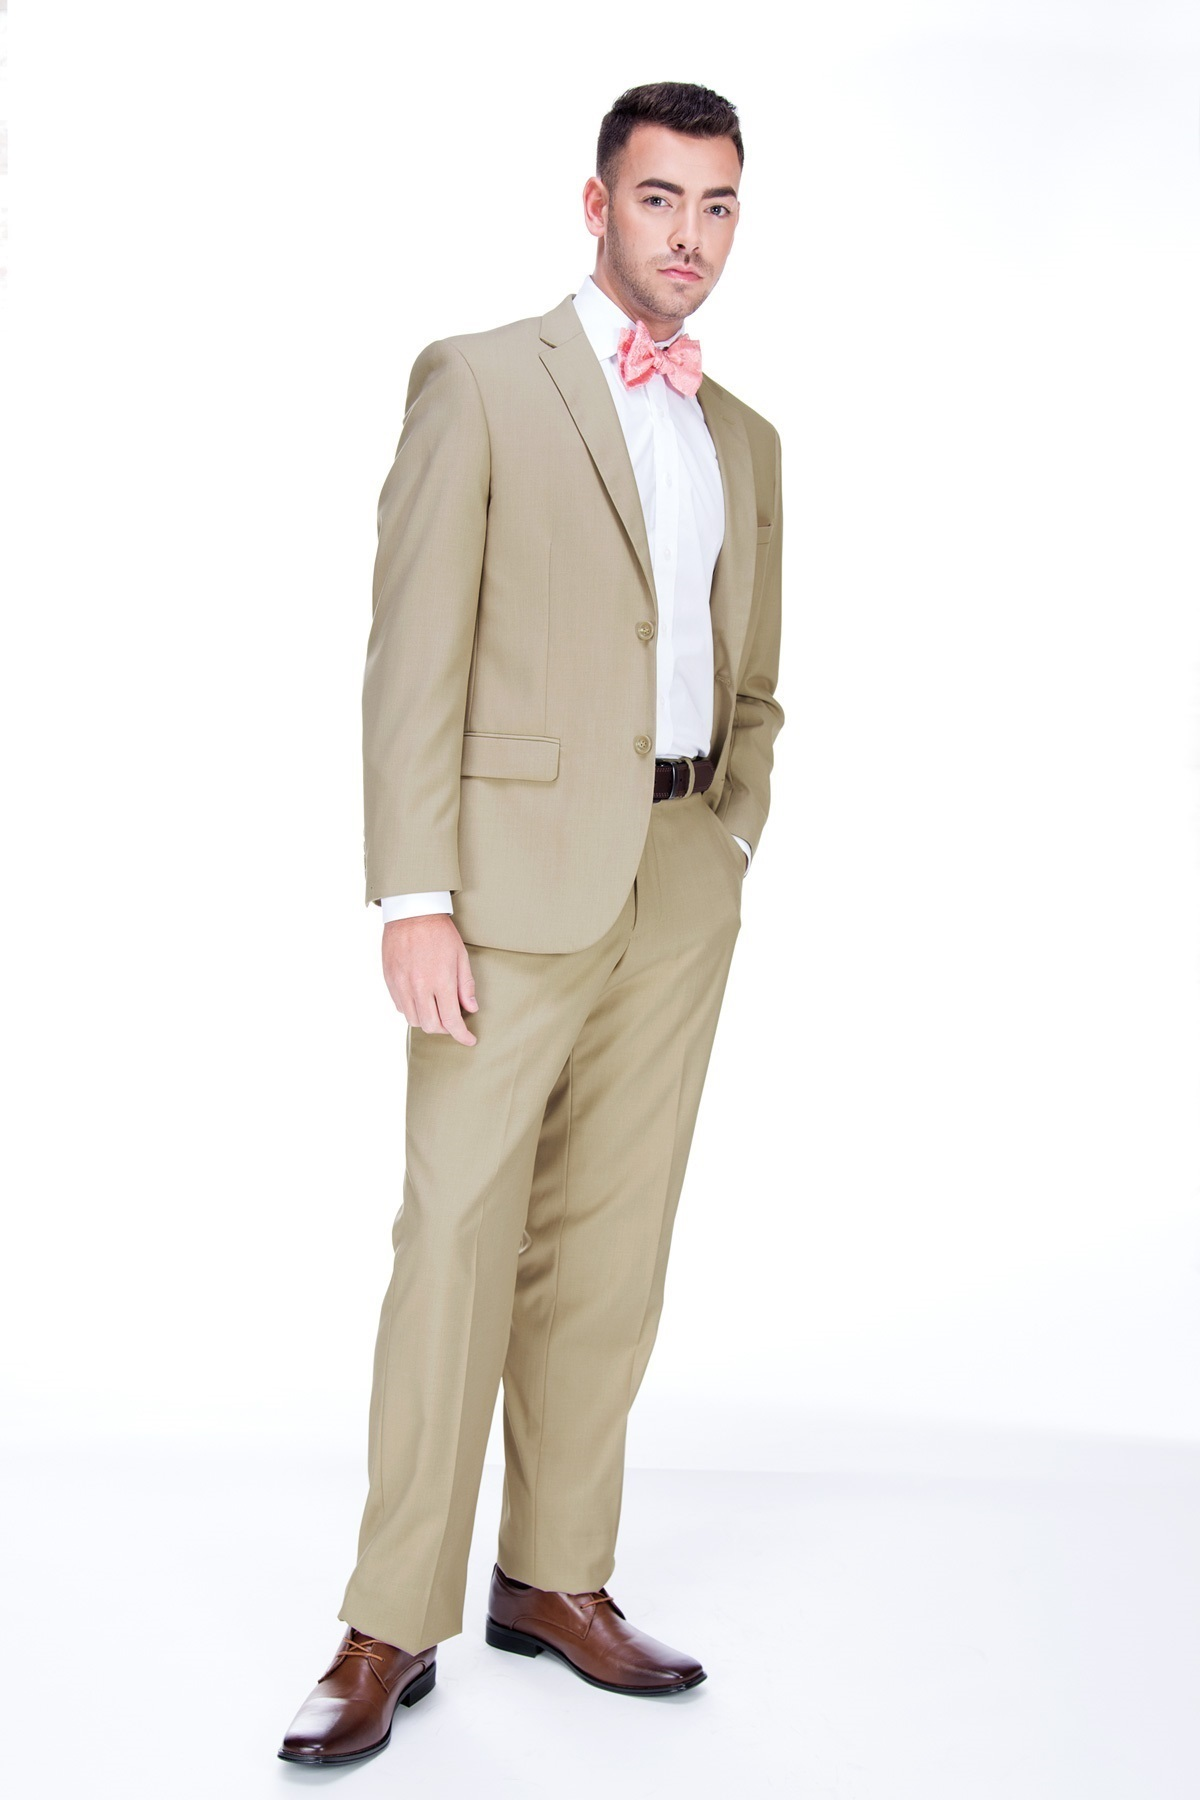 MFWtux.com - Tan Wedding Suit